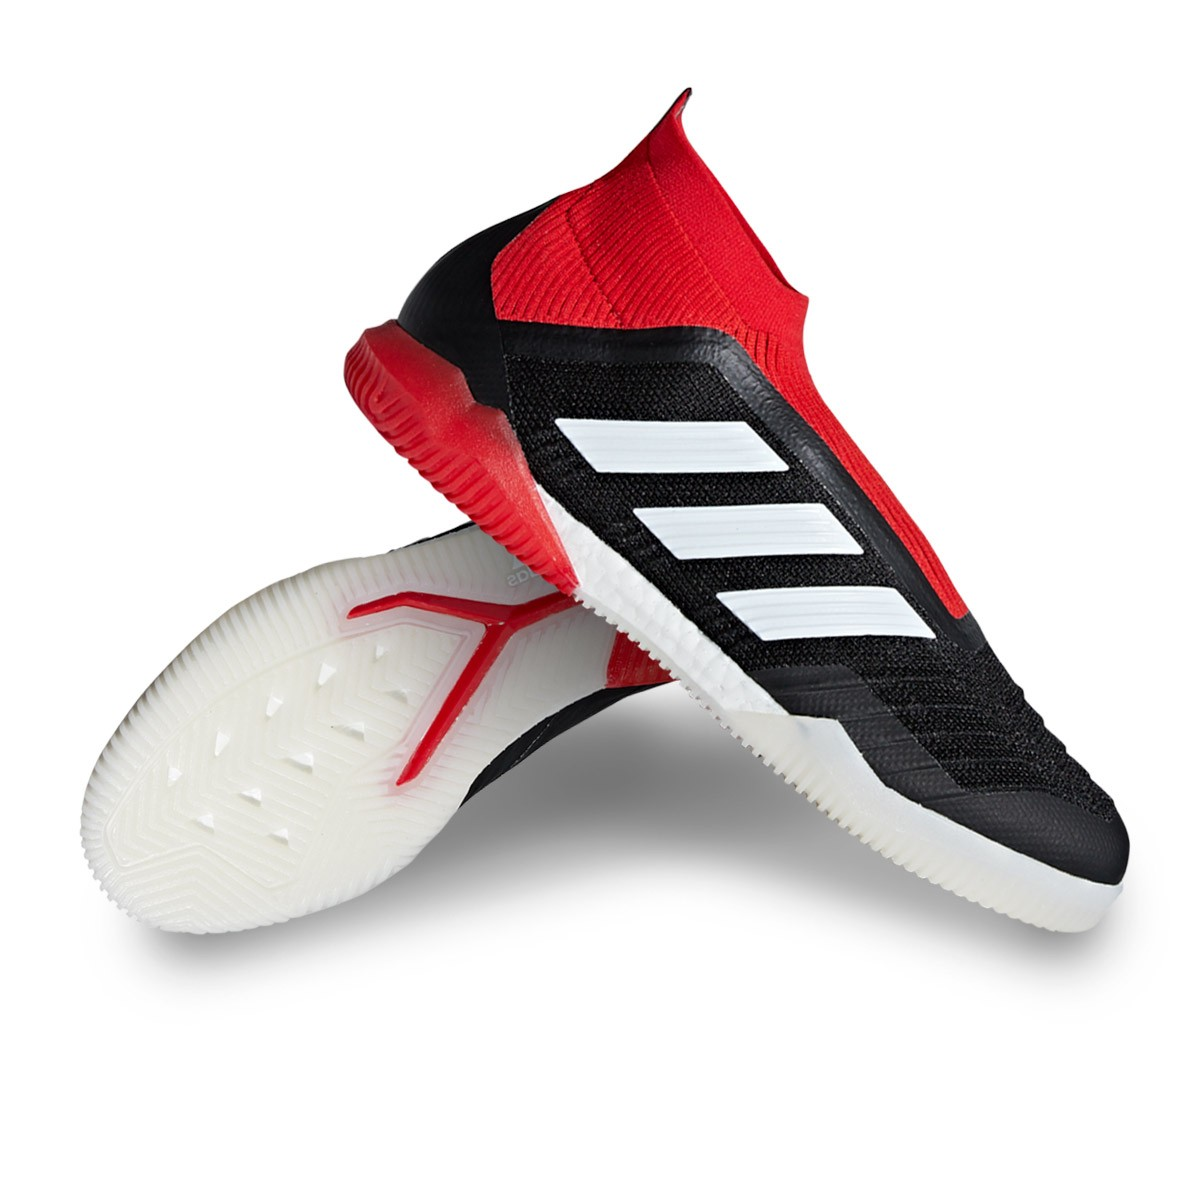 d34660561 Futsal Boot adidas Predator Tango 18+ IN Core black-White-Red - Leaked  soccer